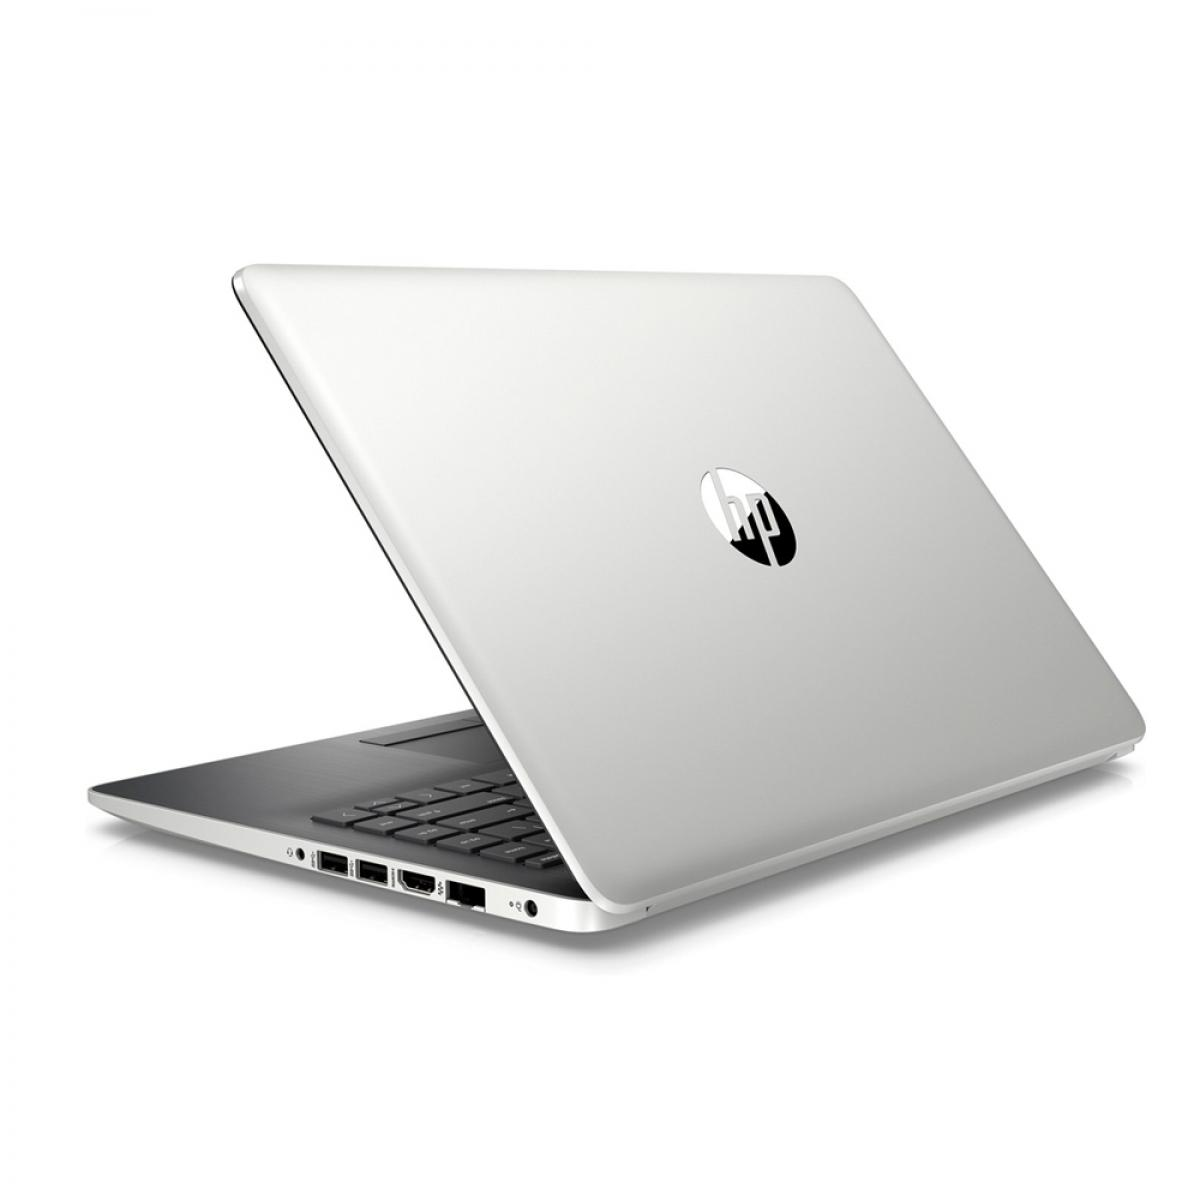 [New Arrival]HP ProBook 430 G5 i5-8250U 16GB RAM 500GB SSD Webcam, BT, fingerprint 13 display Windows 10 professional 1 year warranty Free HP Bag and wireless mouse